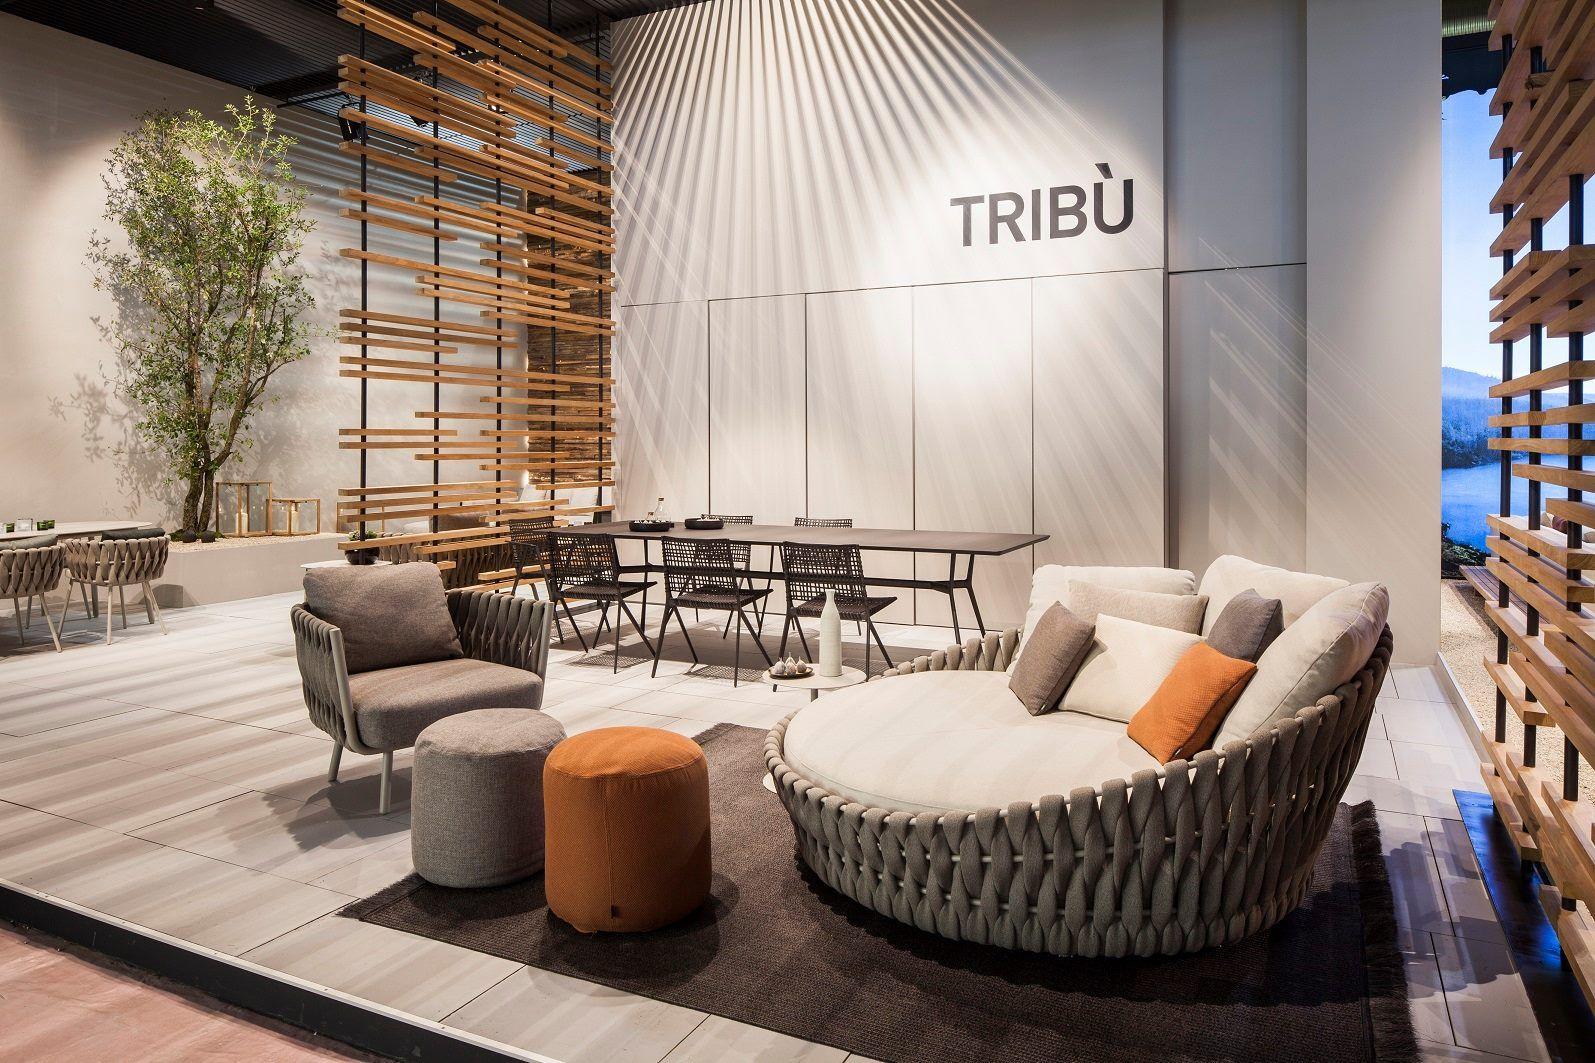 beamsderfer bright green office. Tribu Furniture. Milan Outdoor Furniture - Google Search Beamsderfer Bright Green Office